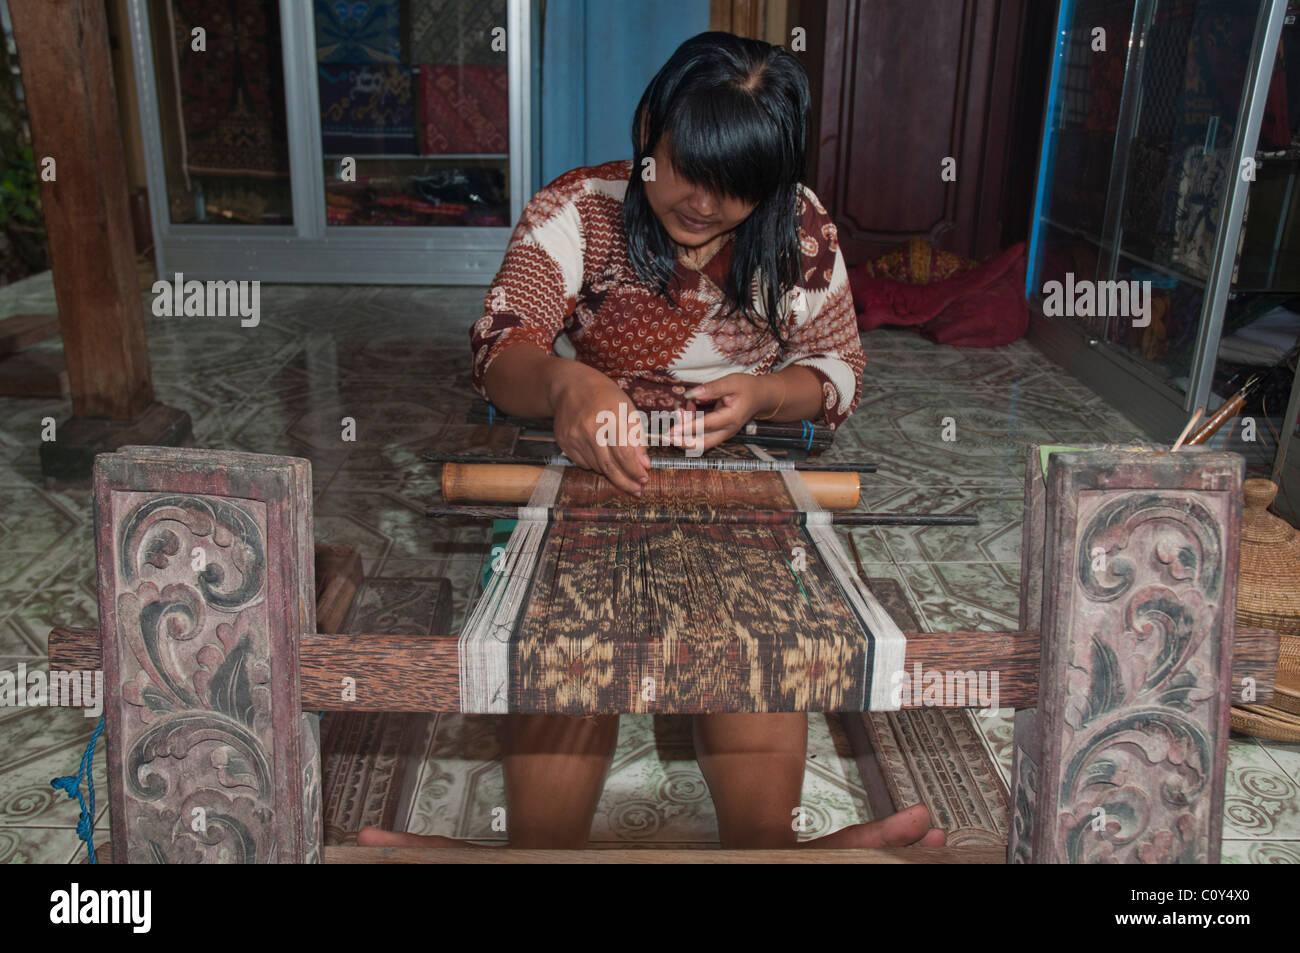 Woman doing traditional ikat weaving in the aboriginal Aga village of Tenganan in eastern Bali - Stock Image